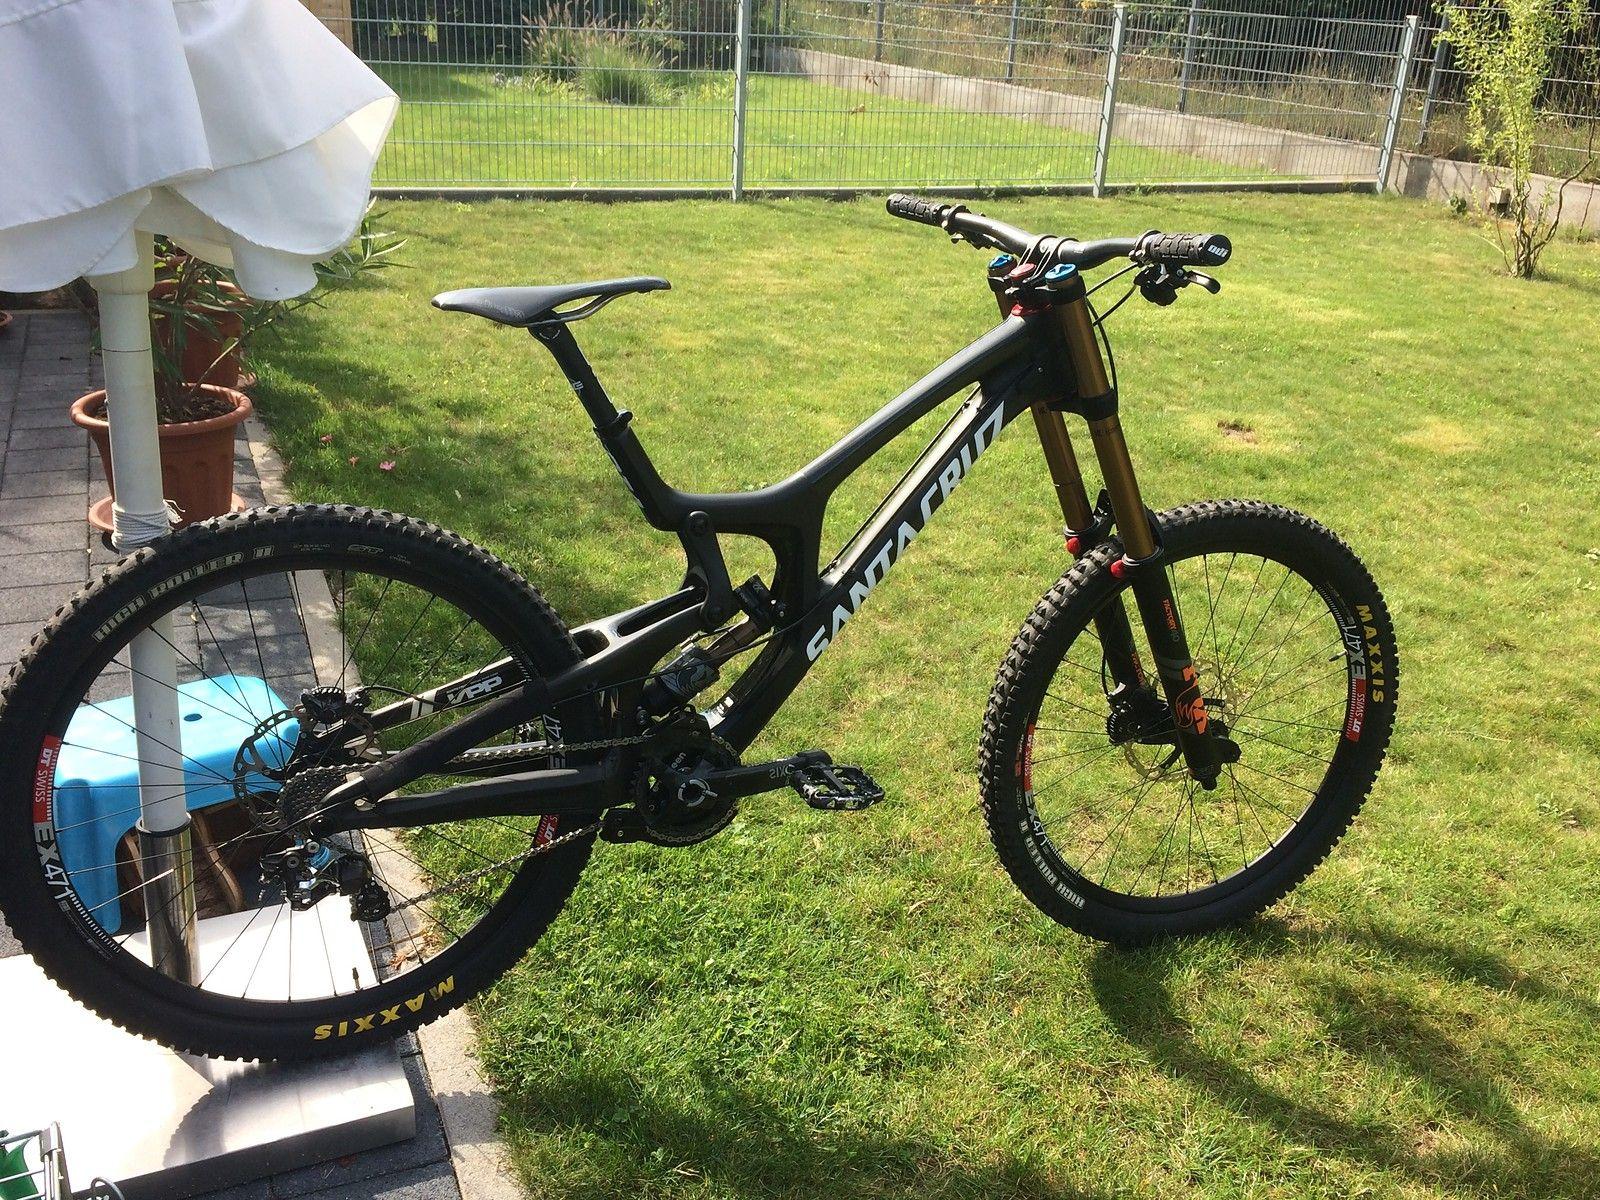 Oftersheim | CycleOps | Santa cruz v10, Santa cruz, Bike